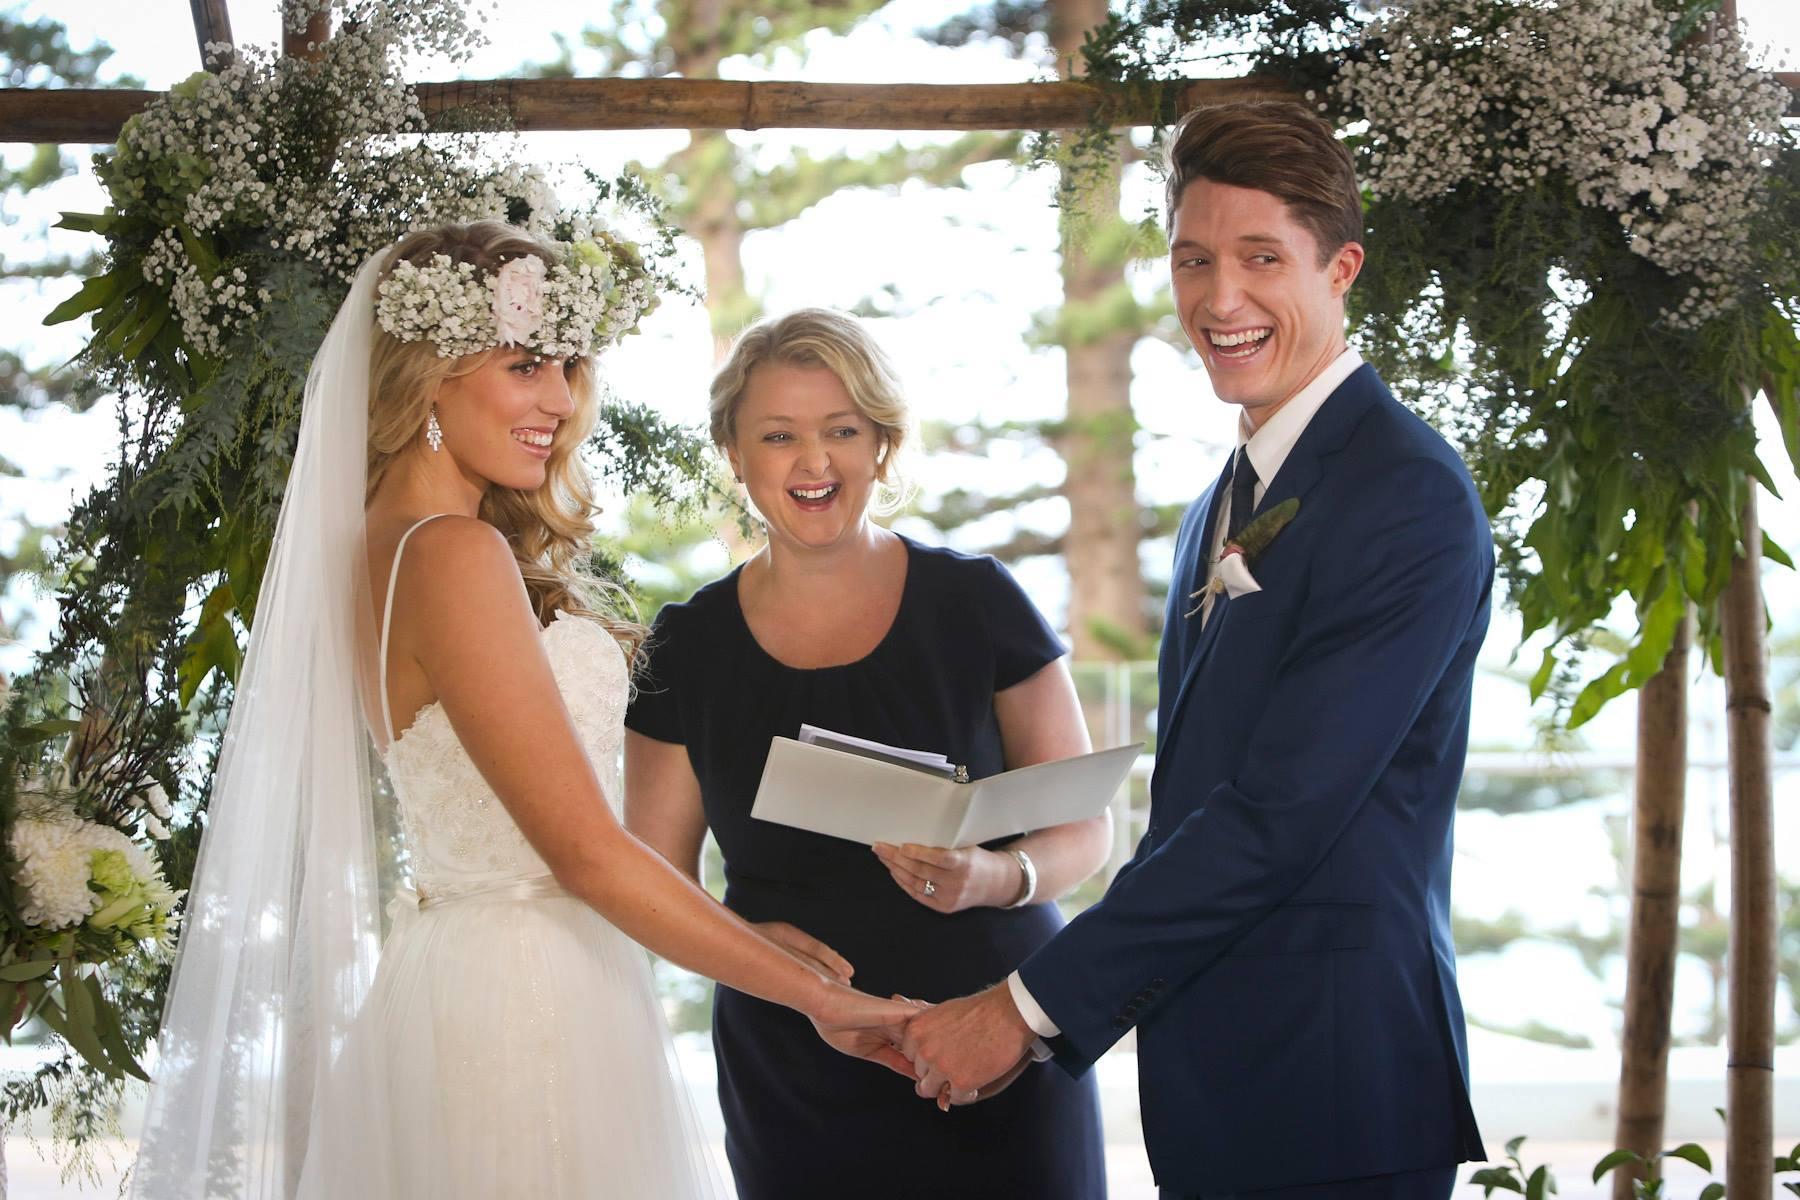 Married by lisa | lisa parker marriage celebrant  Lisa Parker | Married by Lisa  http://marriedbylisa.com.au/   Telephone Lisa on 0431 926 574